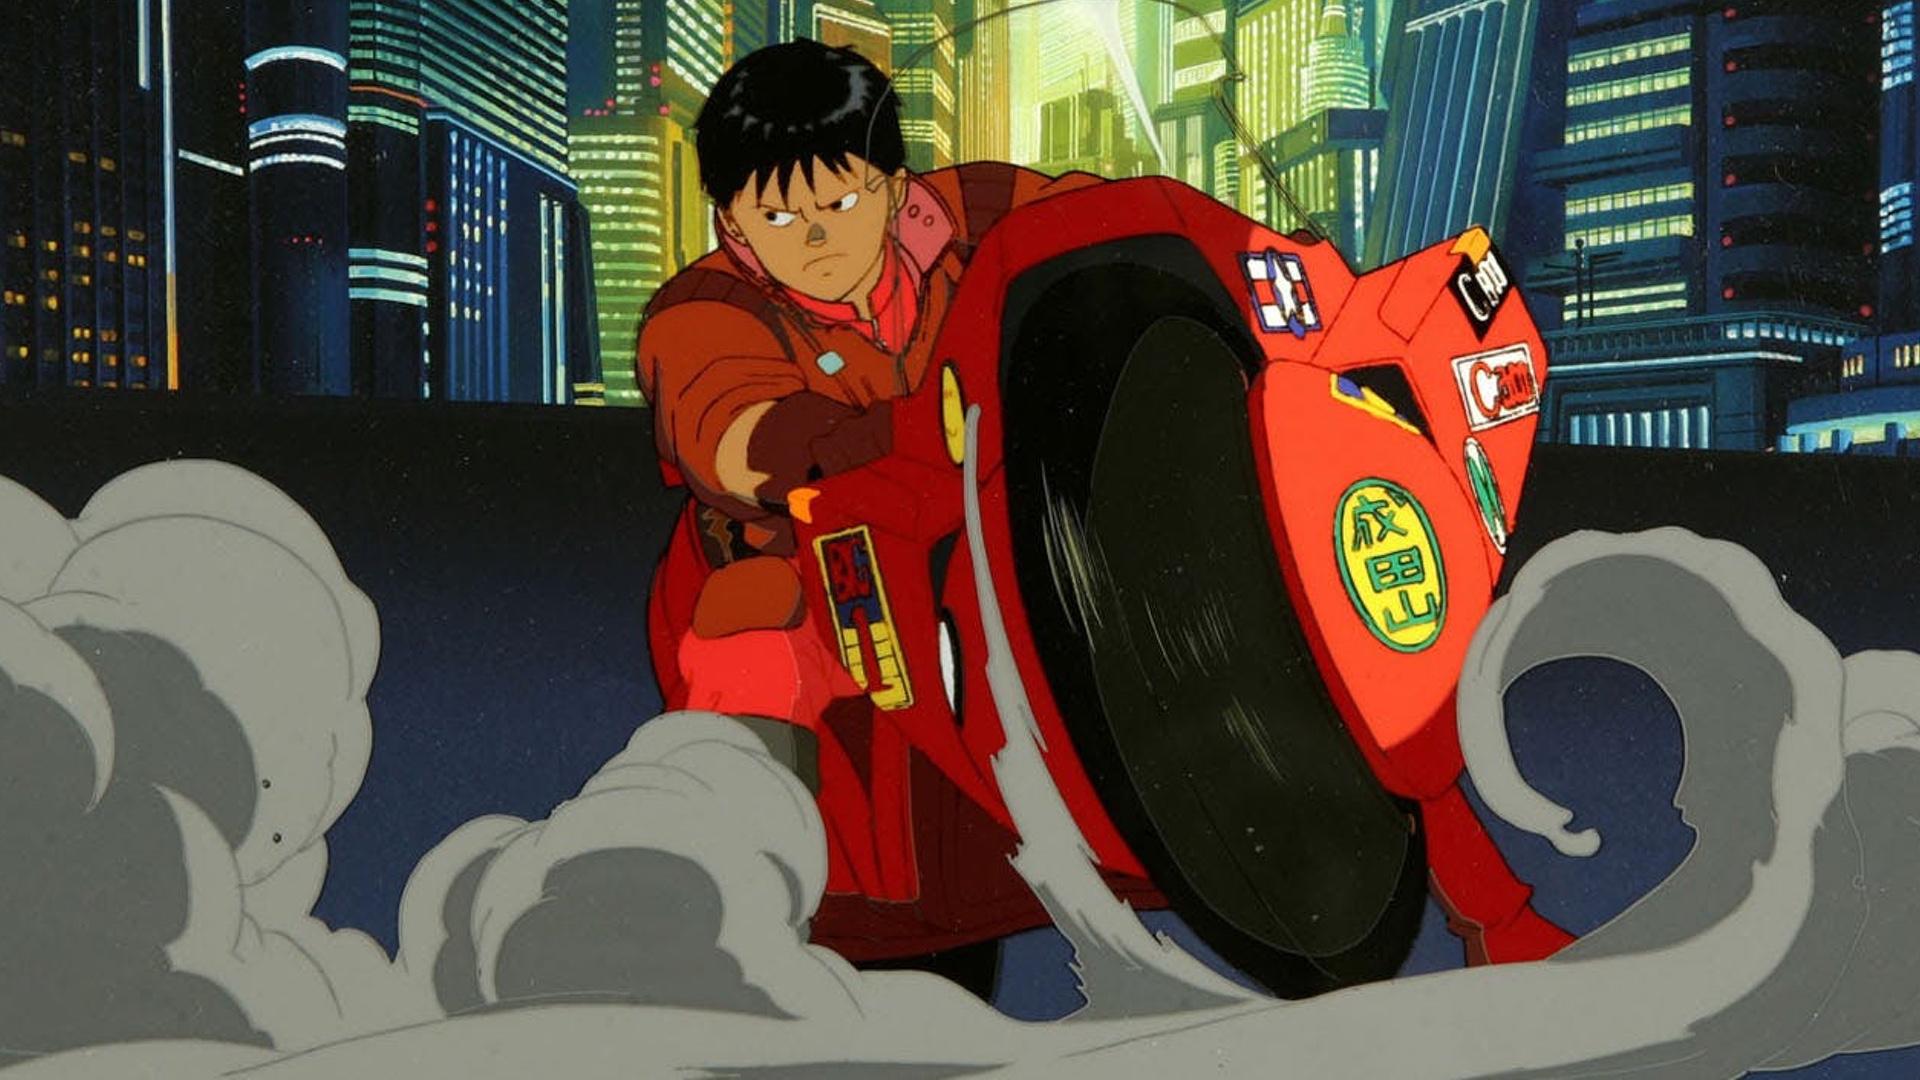 There's an AKIRA Anime Sequel Coming From Creator Katsuhiro